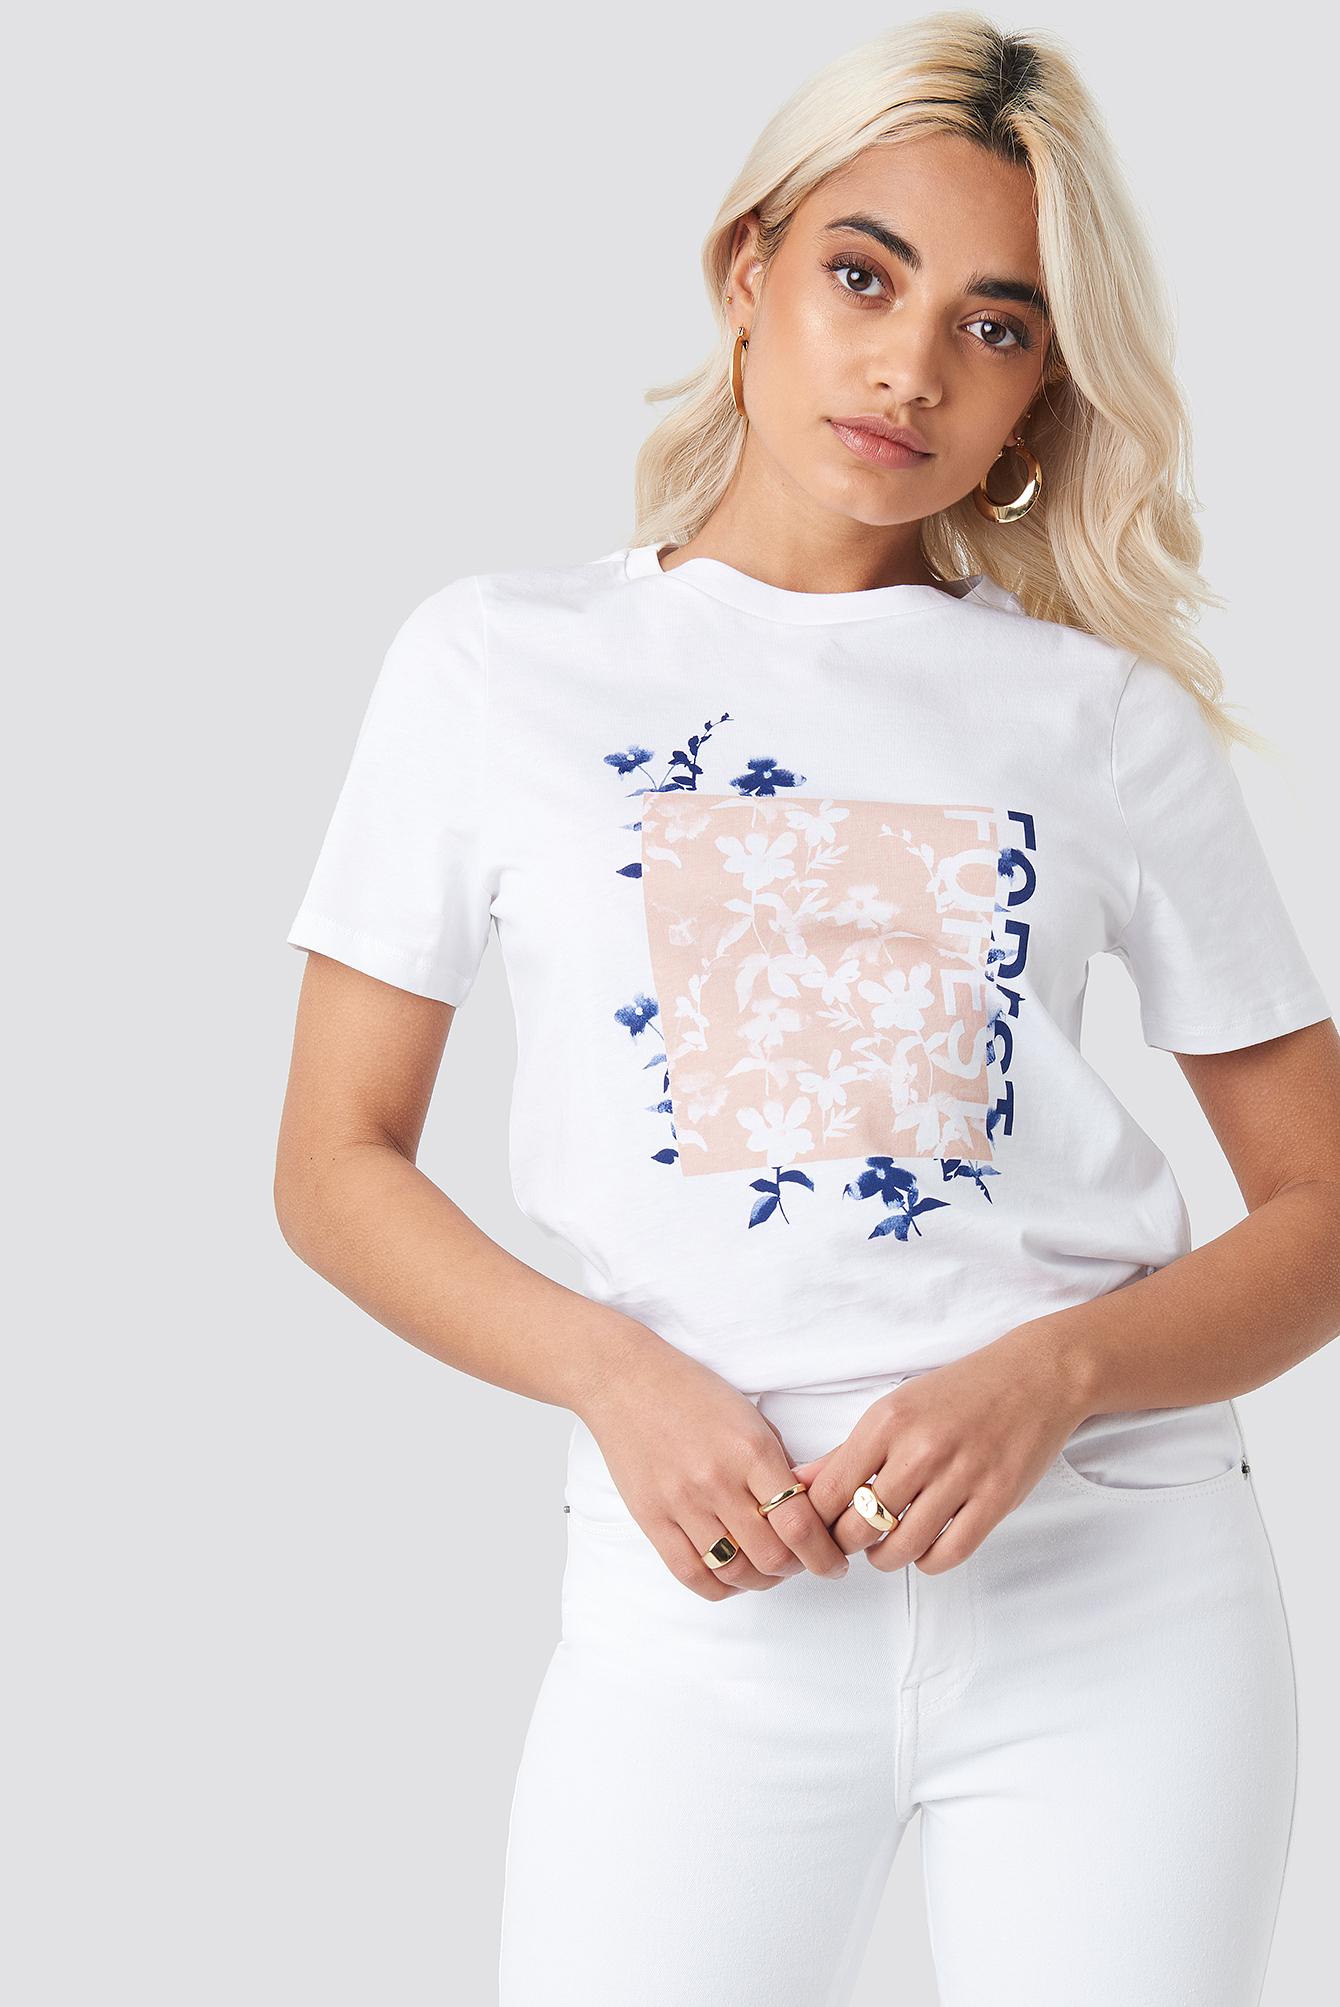 Forest T-shirt NA-KD.COM